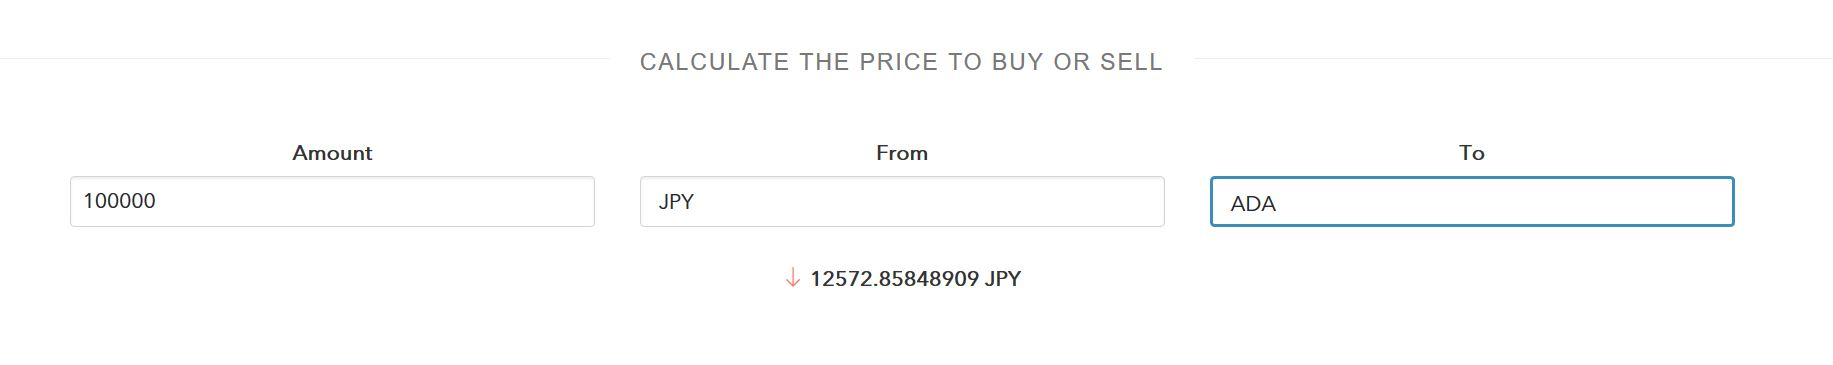 Price Chart -JPY